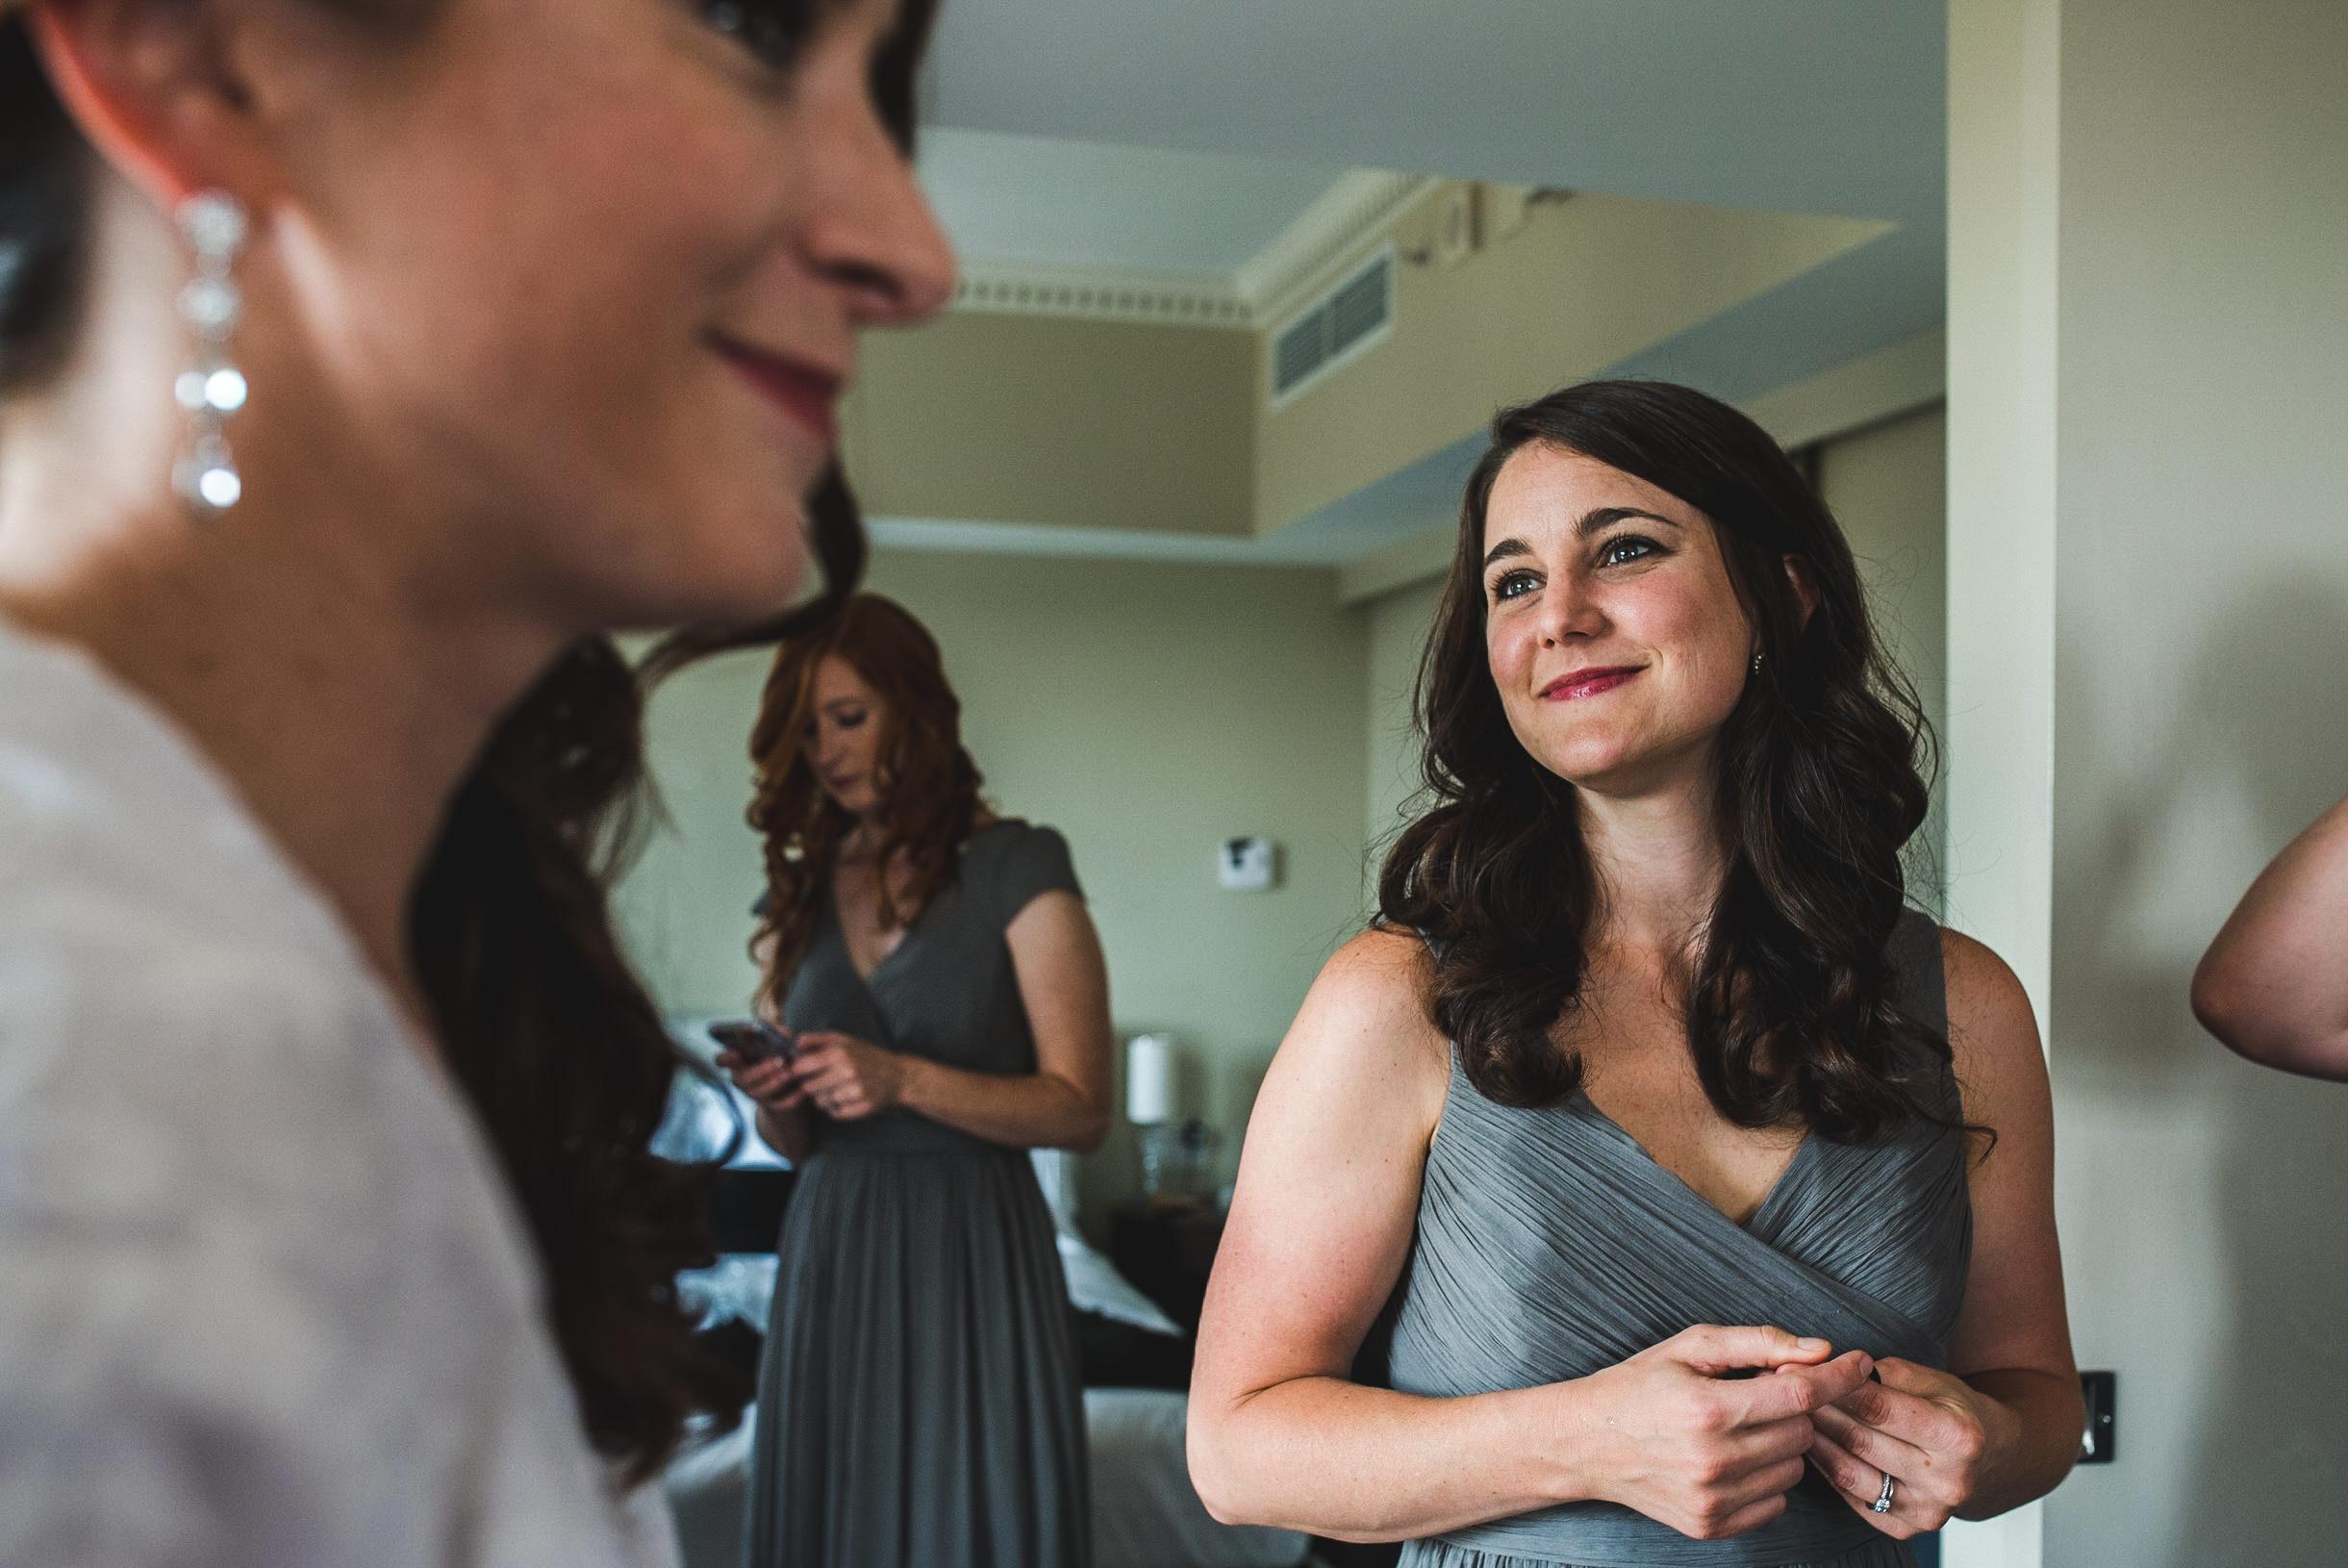 Wedding at W Hotel Washington DC by Mantas Kubilinskas-5.jpg